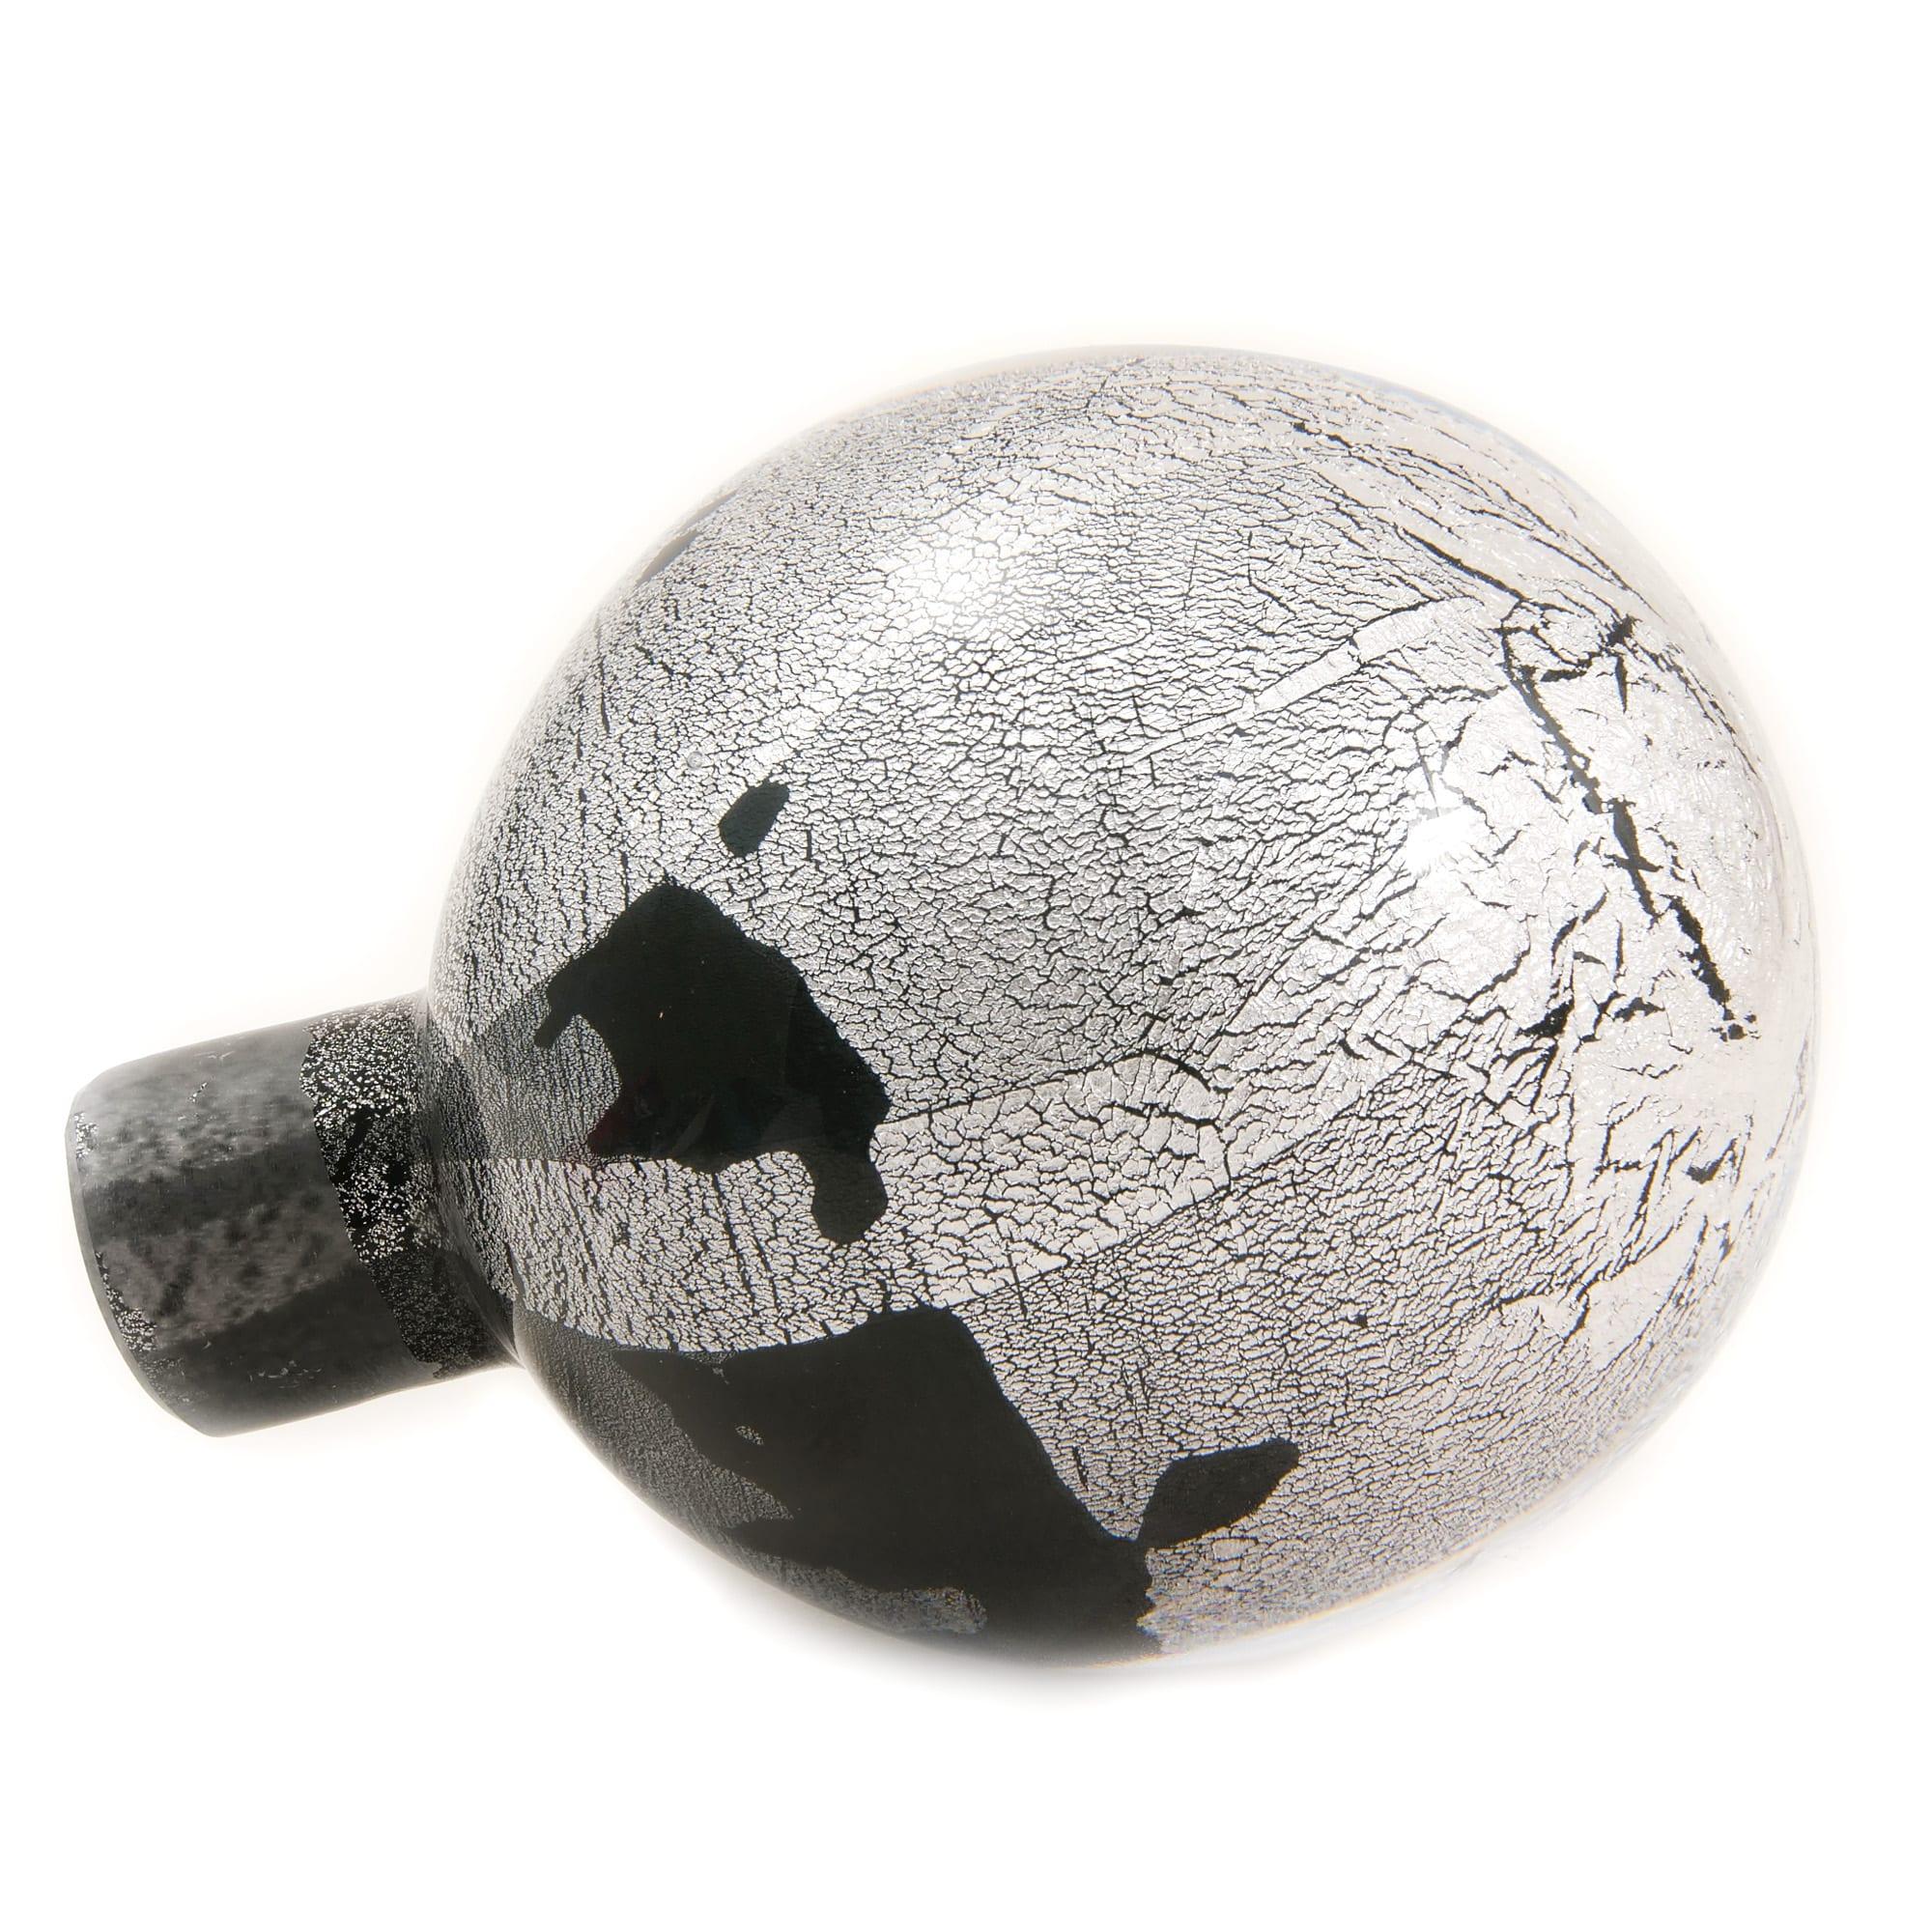 Silver Leaf Banister Ball - Black